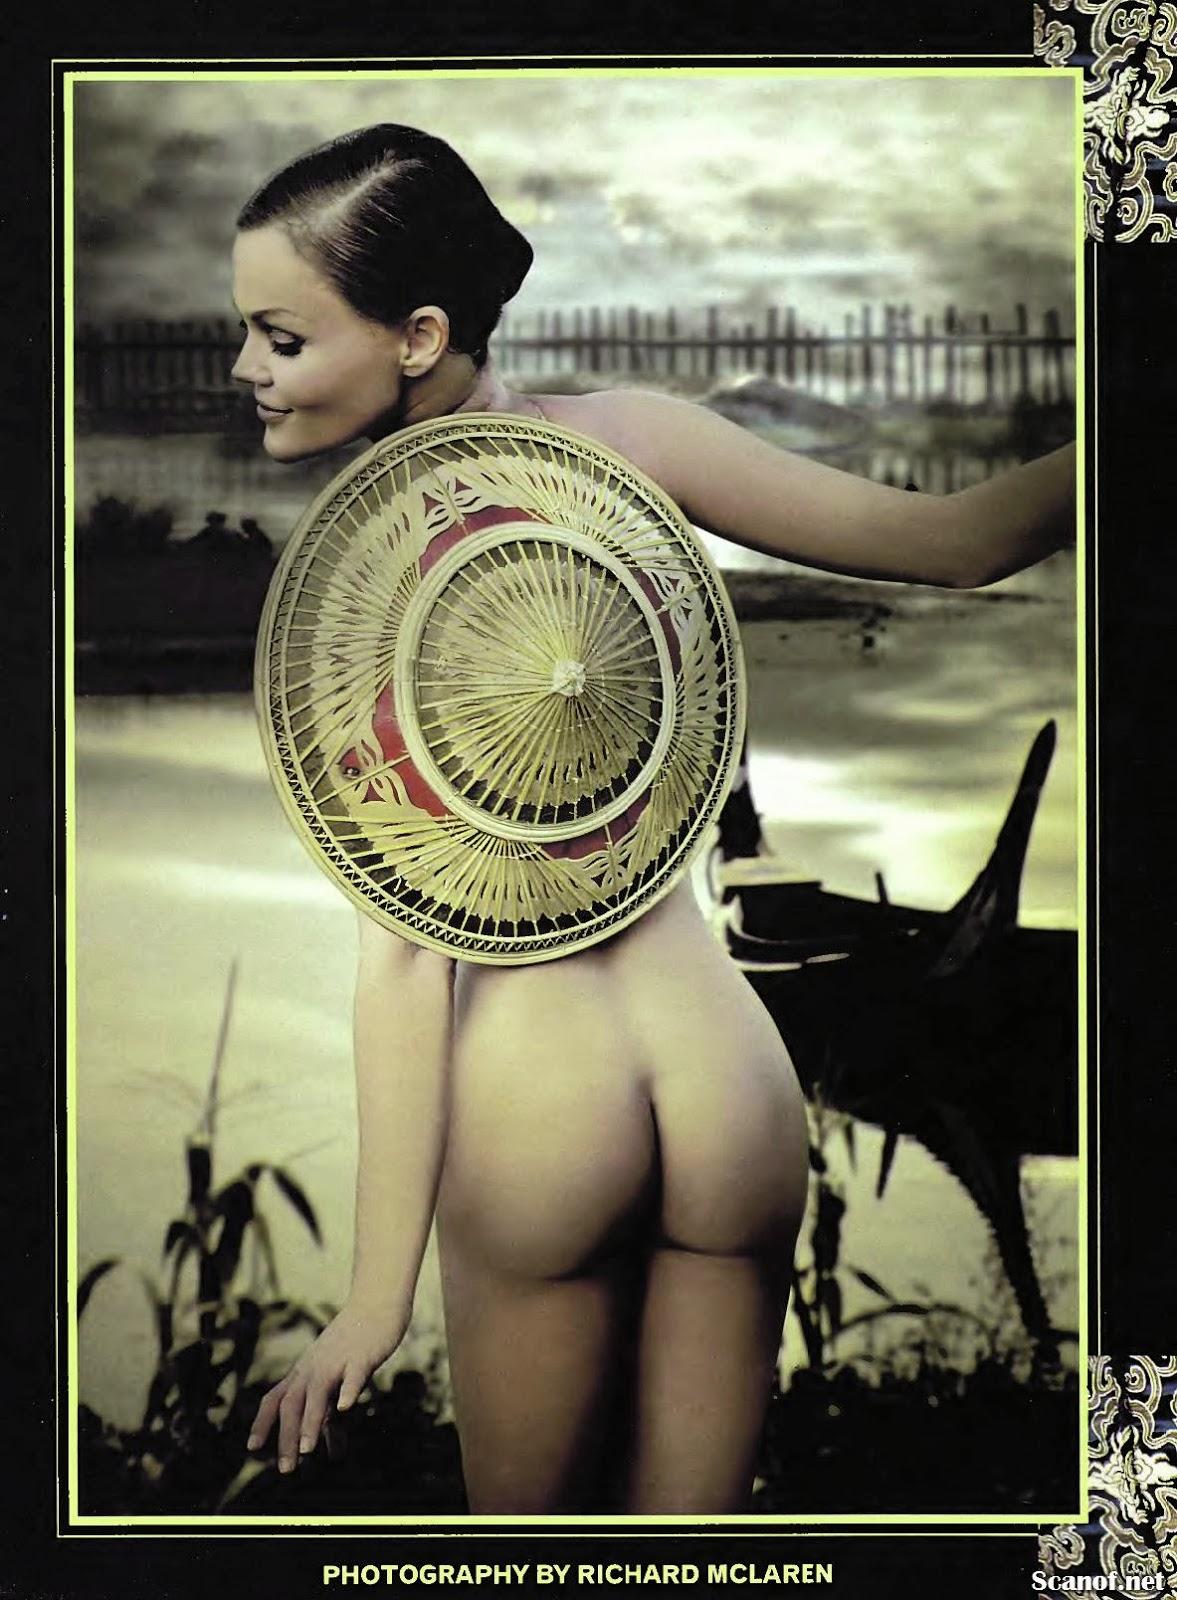 Pussy ROCKS! - Página 2 Belinda+Carlisle++Playboy+USA+%5BAugust+2001%5D+%287%29